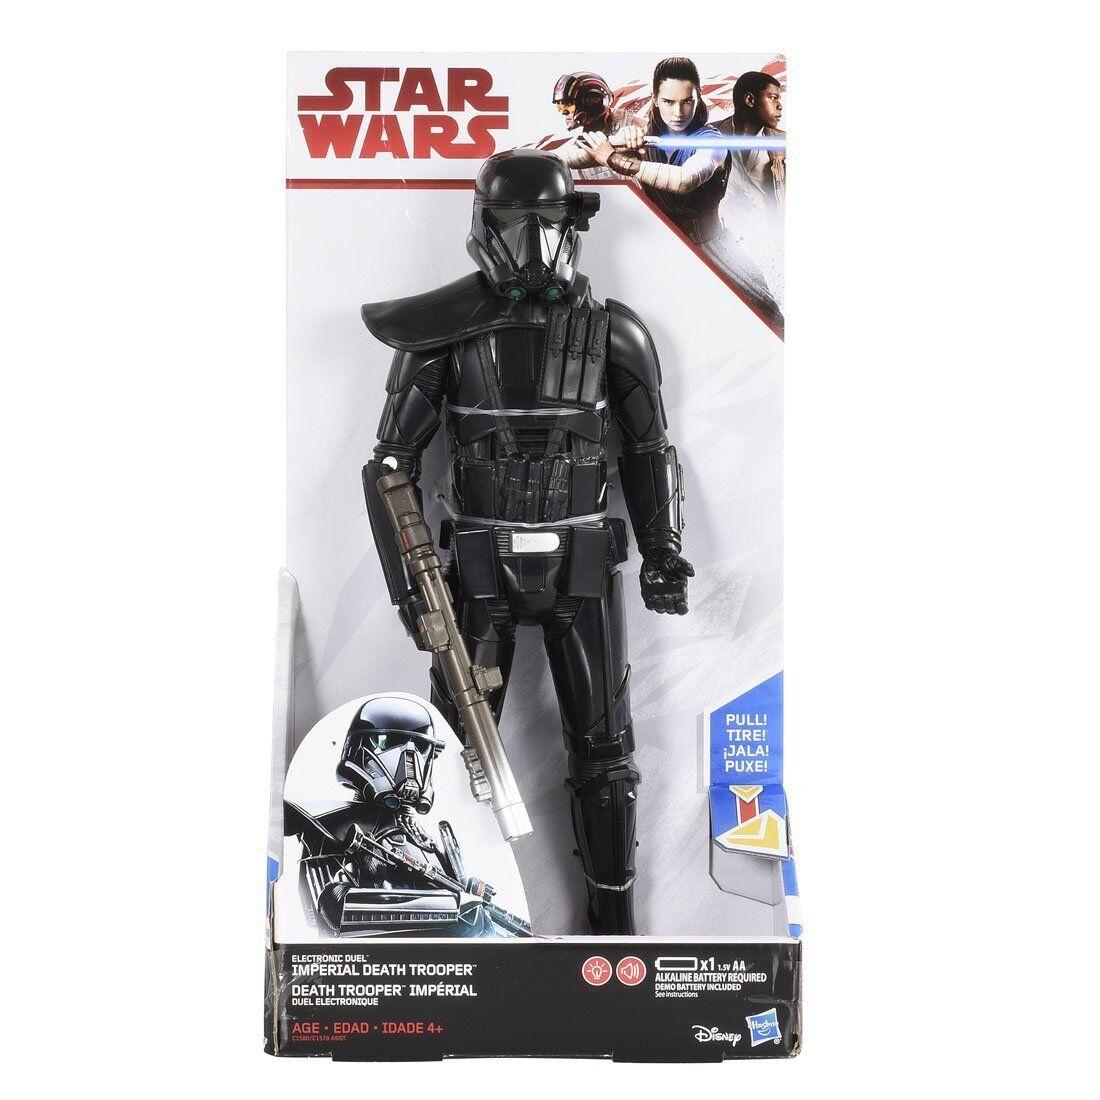 NEW Takara Tomy Star Wars 12 inch Electronic Figure Death Trooper 30cm Japan F/S